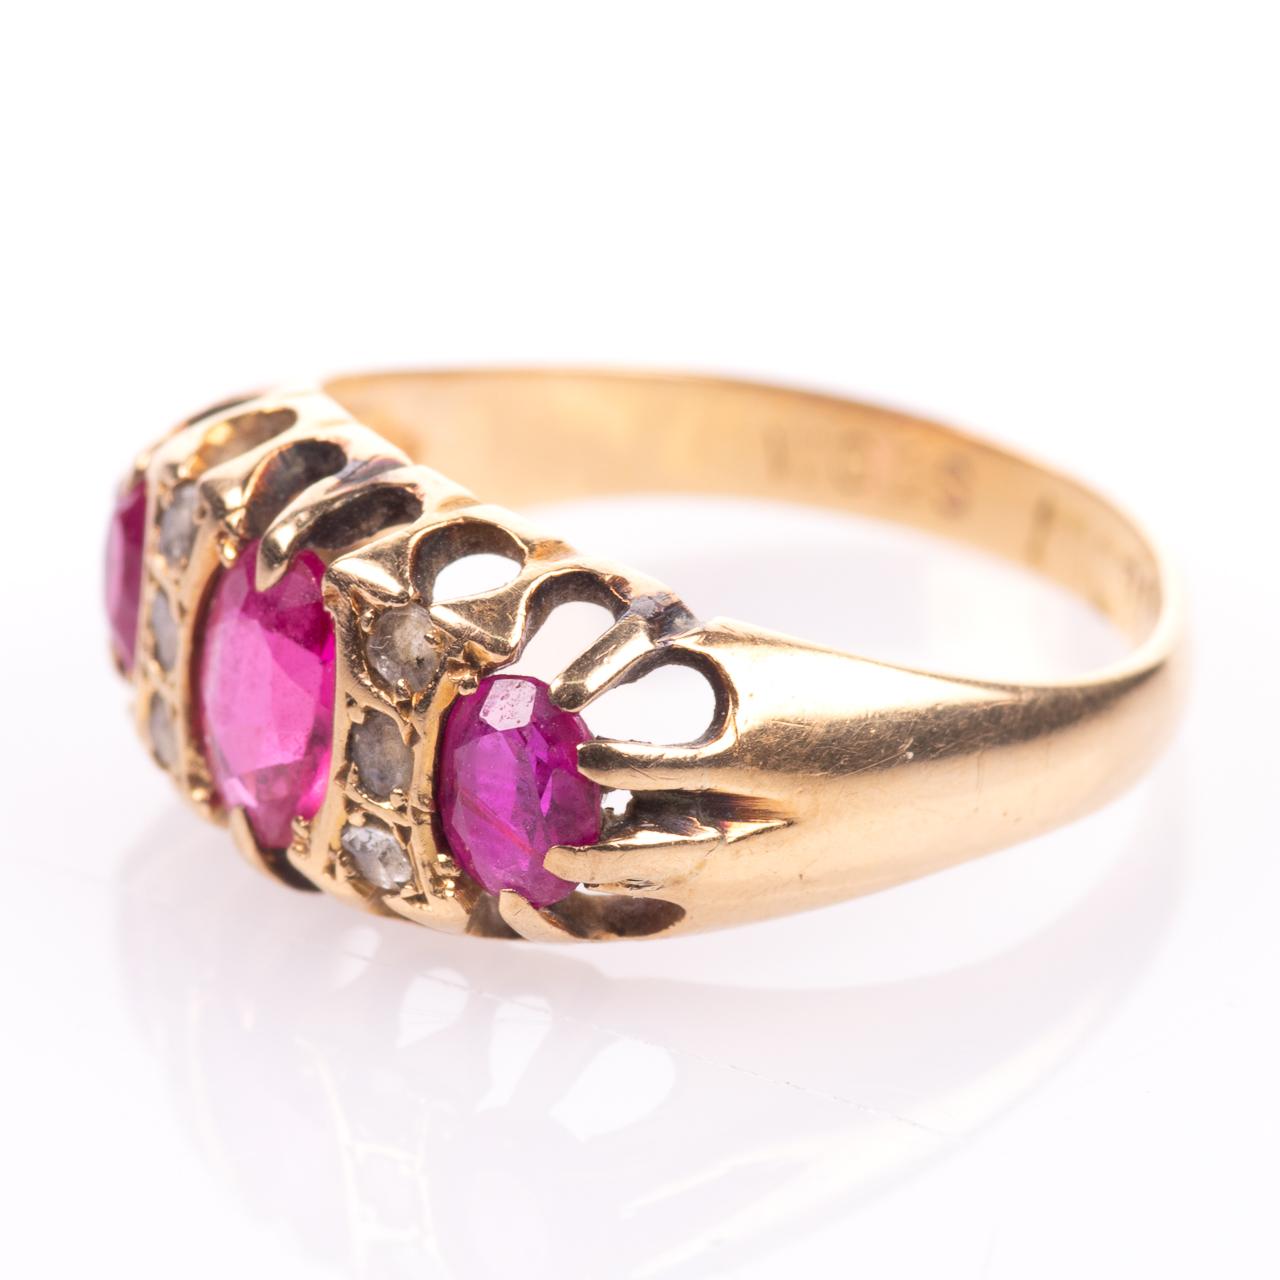 18ct Gold 1.20ct Ruby & Diamond Ring Birmingham 1915 - Image 5 of 7